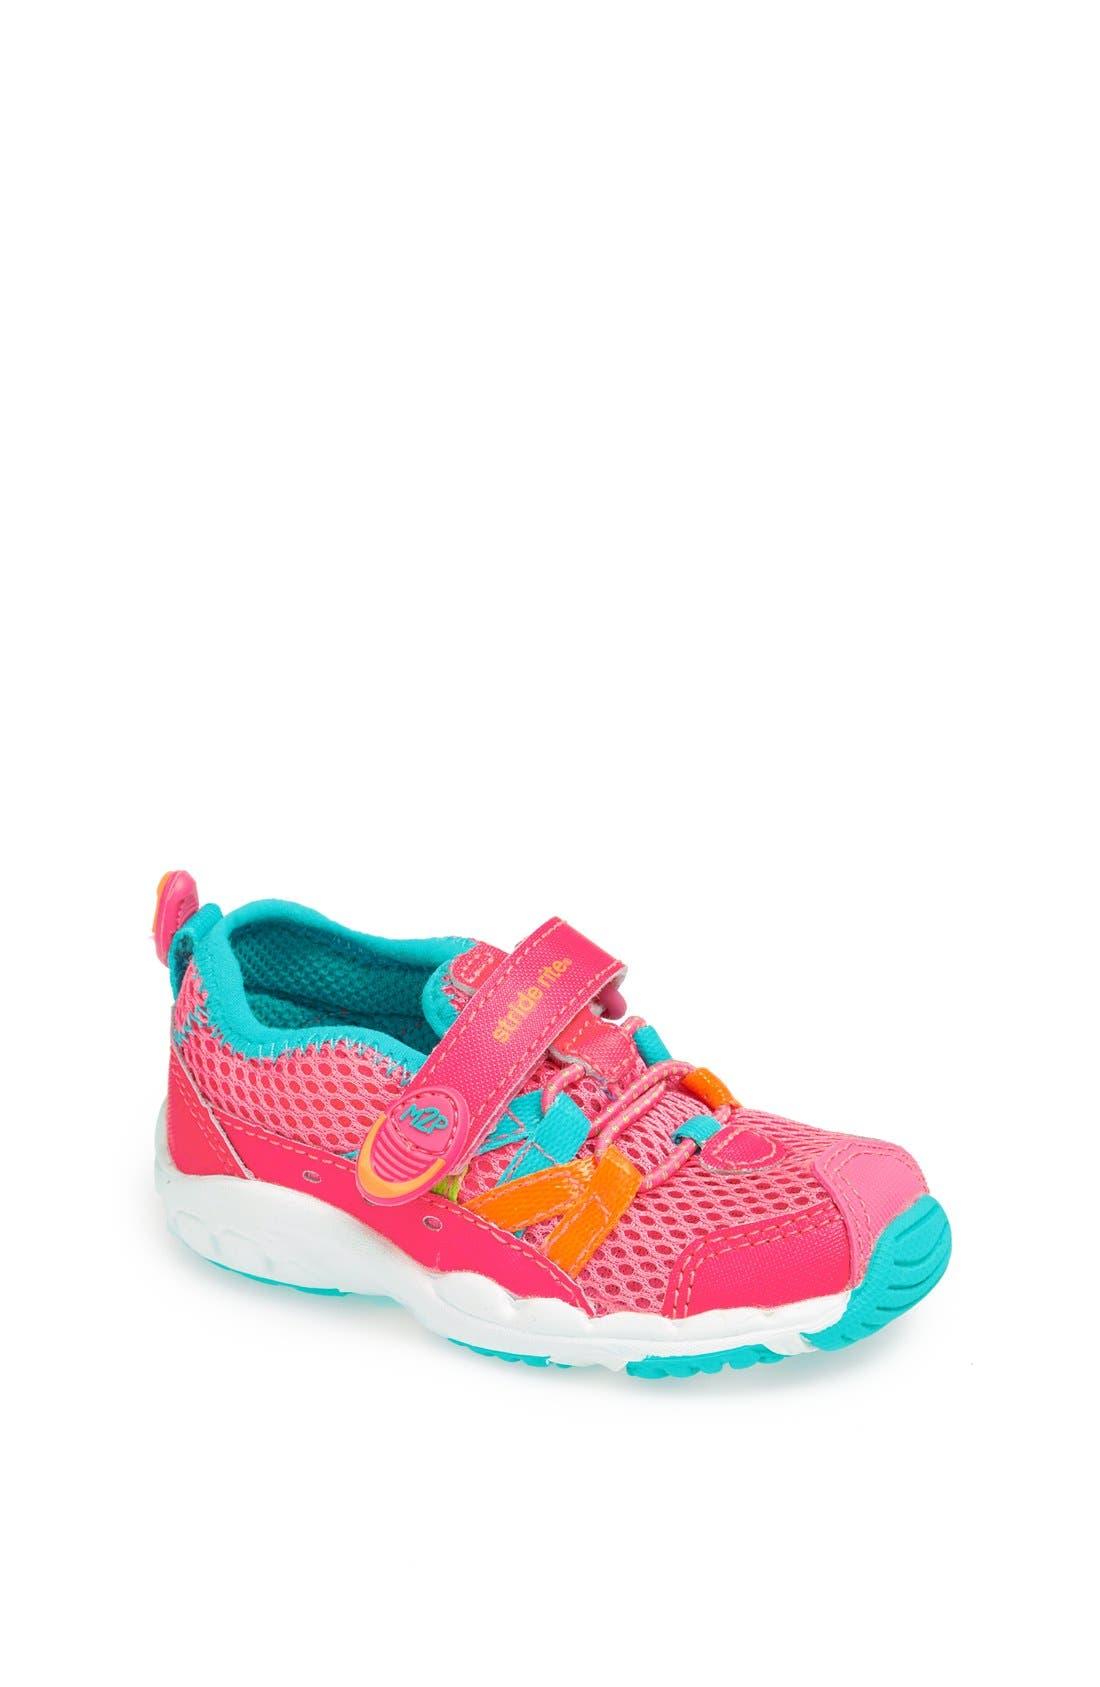 Main Image - Stride Rite 'Made 2 Play™ - Aqua' Sneaker (Baby, Walker & Toddler)